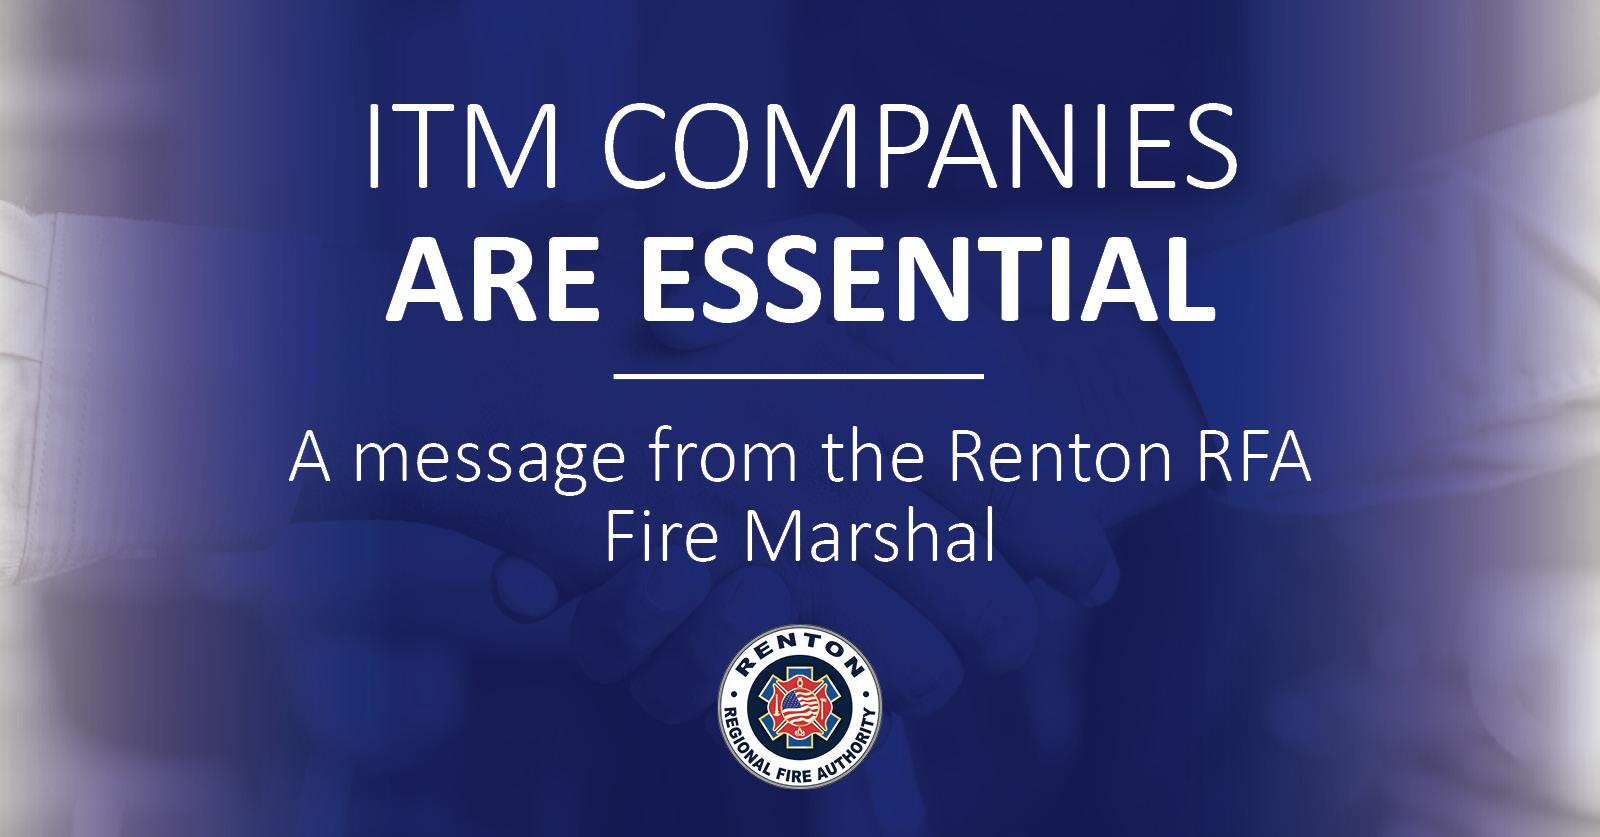 ITM Companies Are Essential Businesses